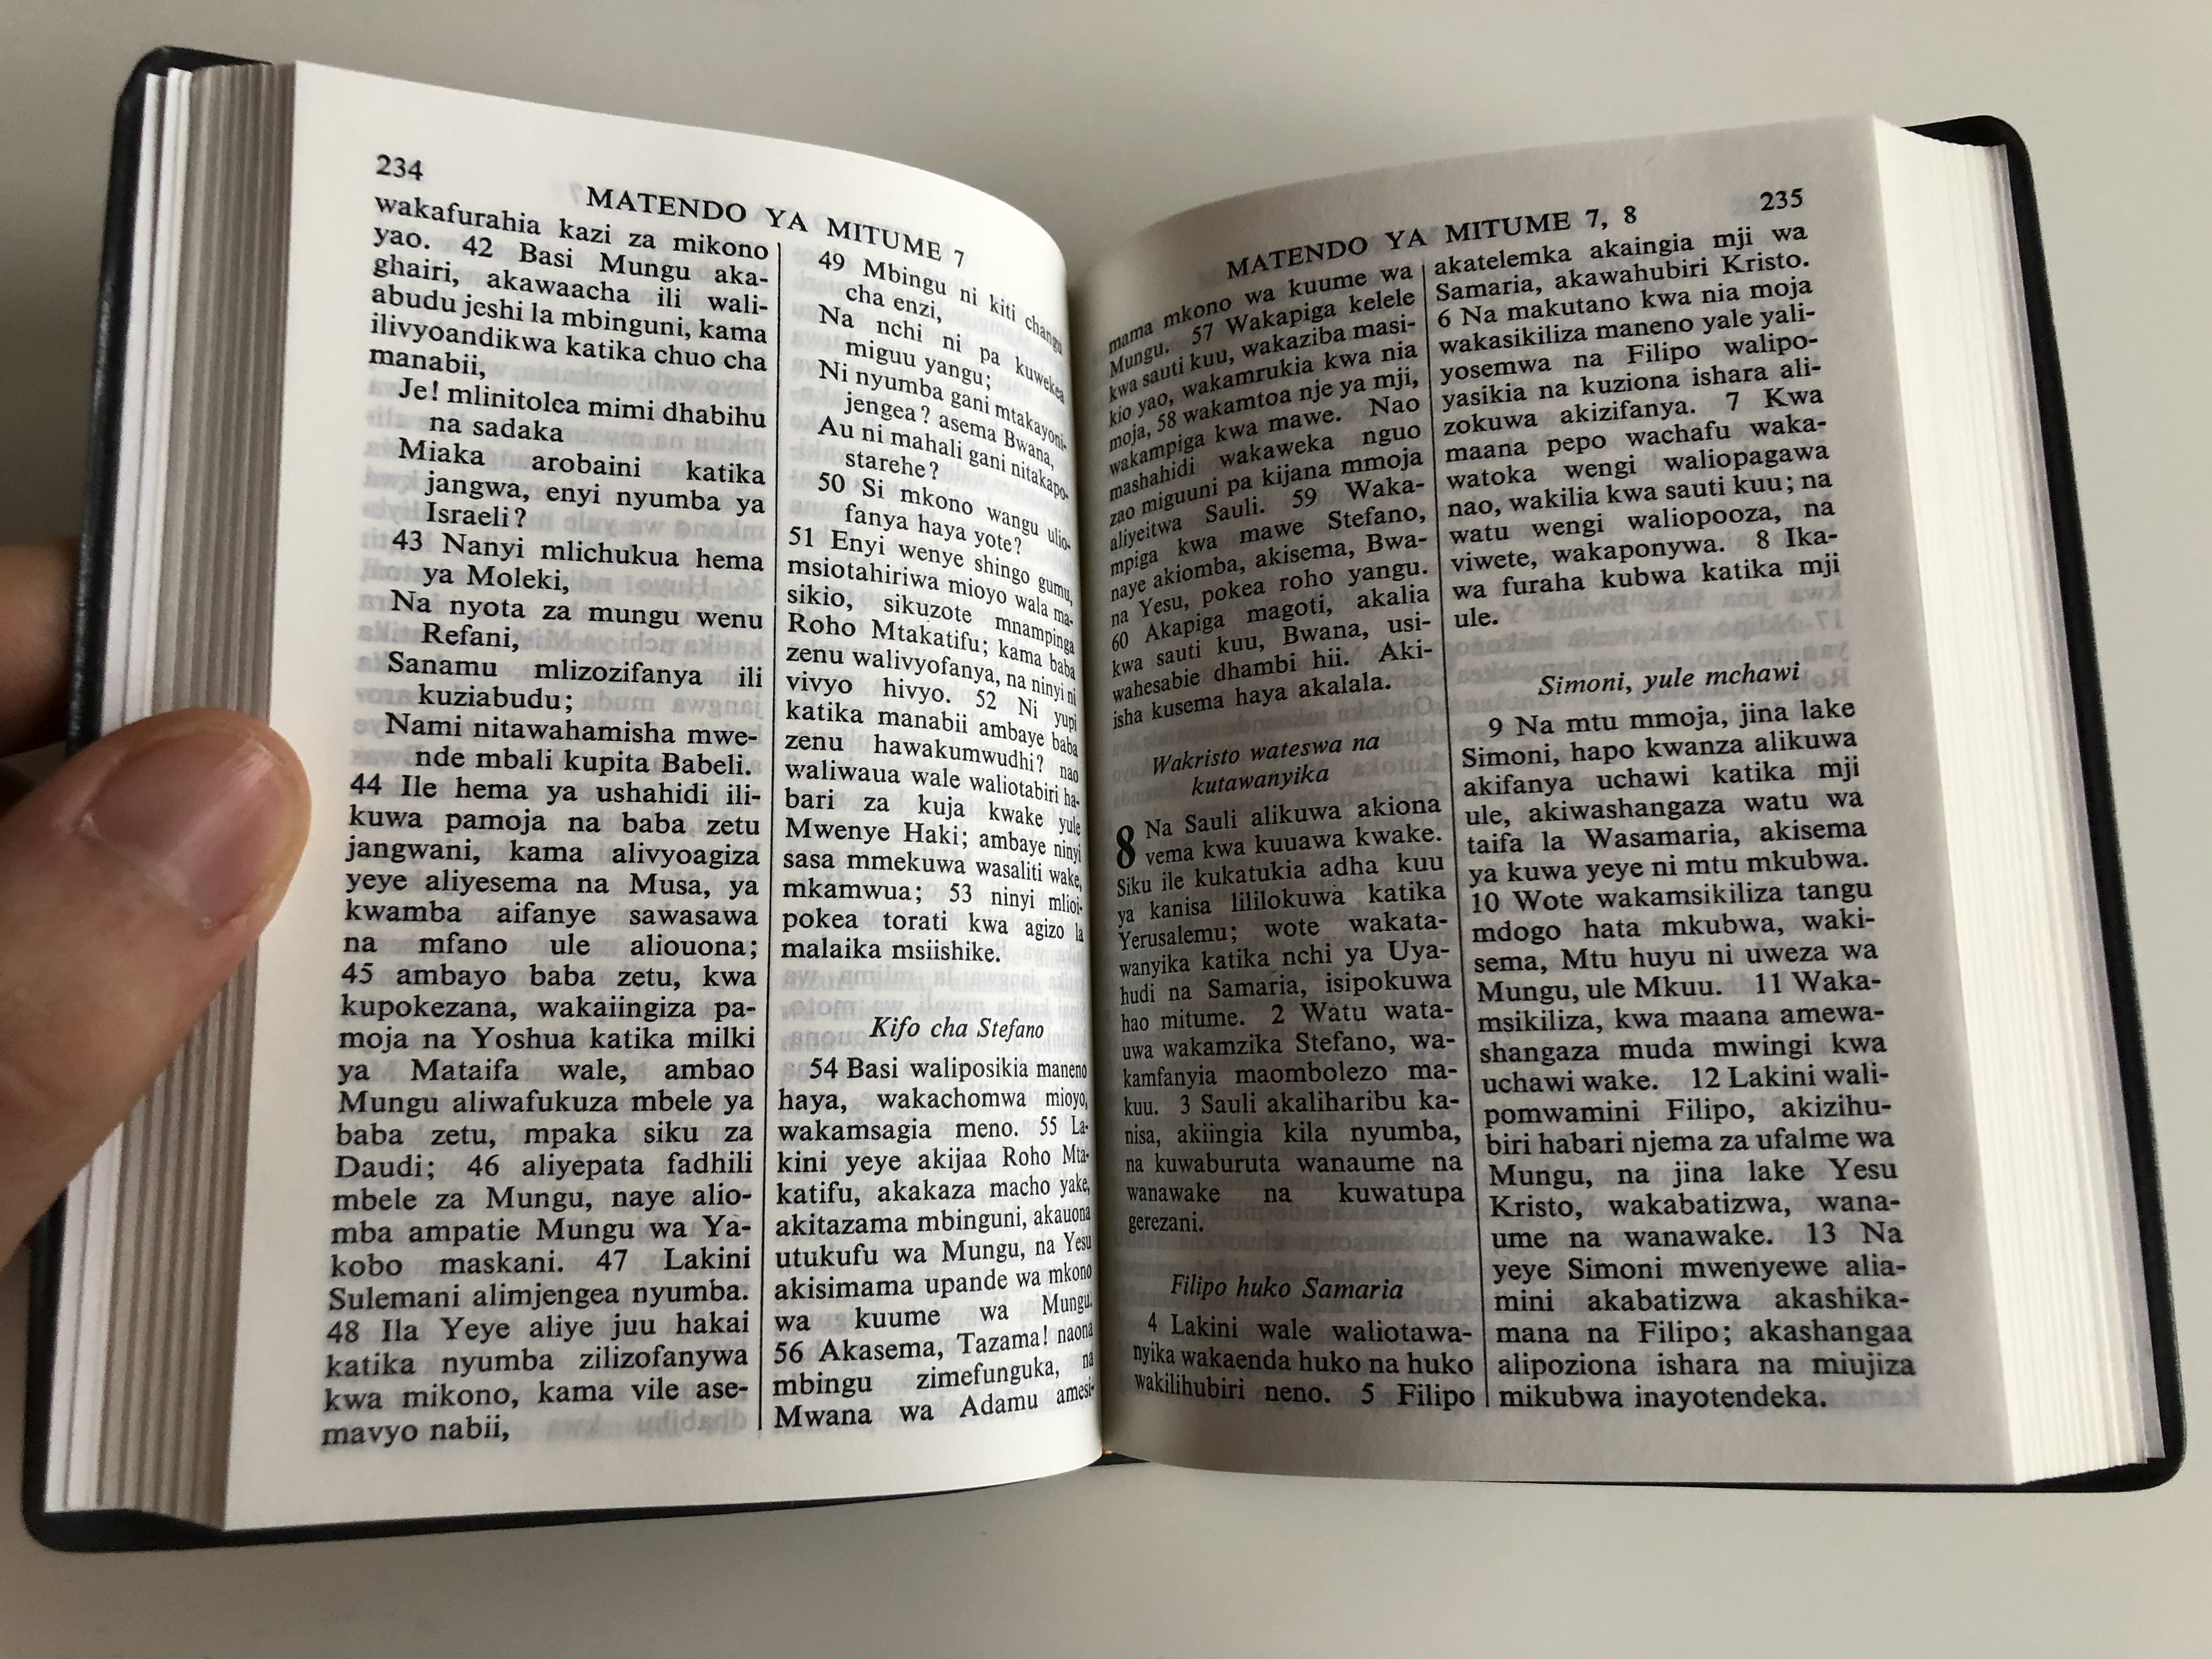 kiswahili-new-testament-psalms-agano-jipya-na-zaburi-9.jpg